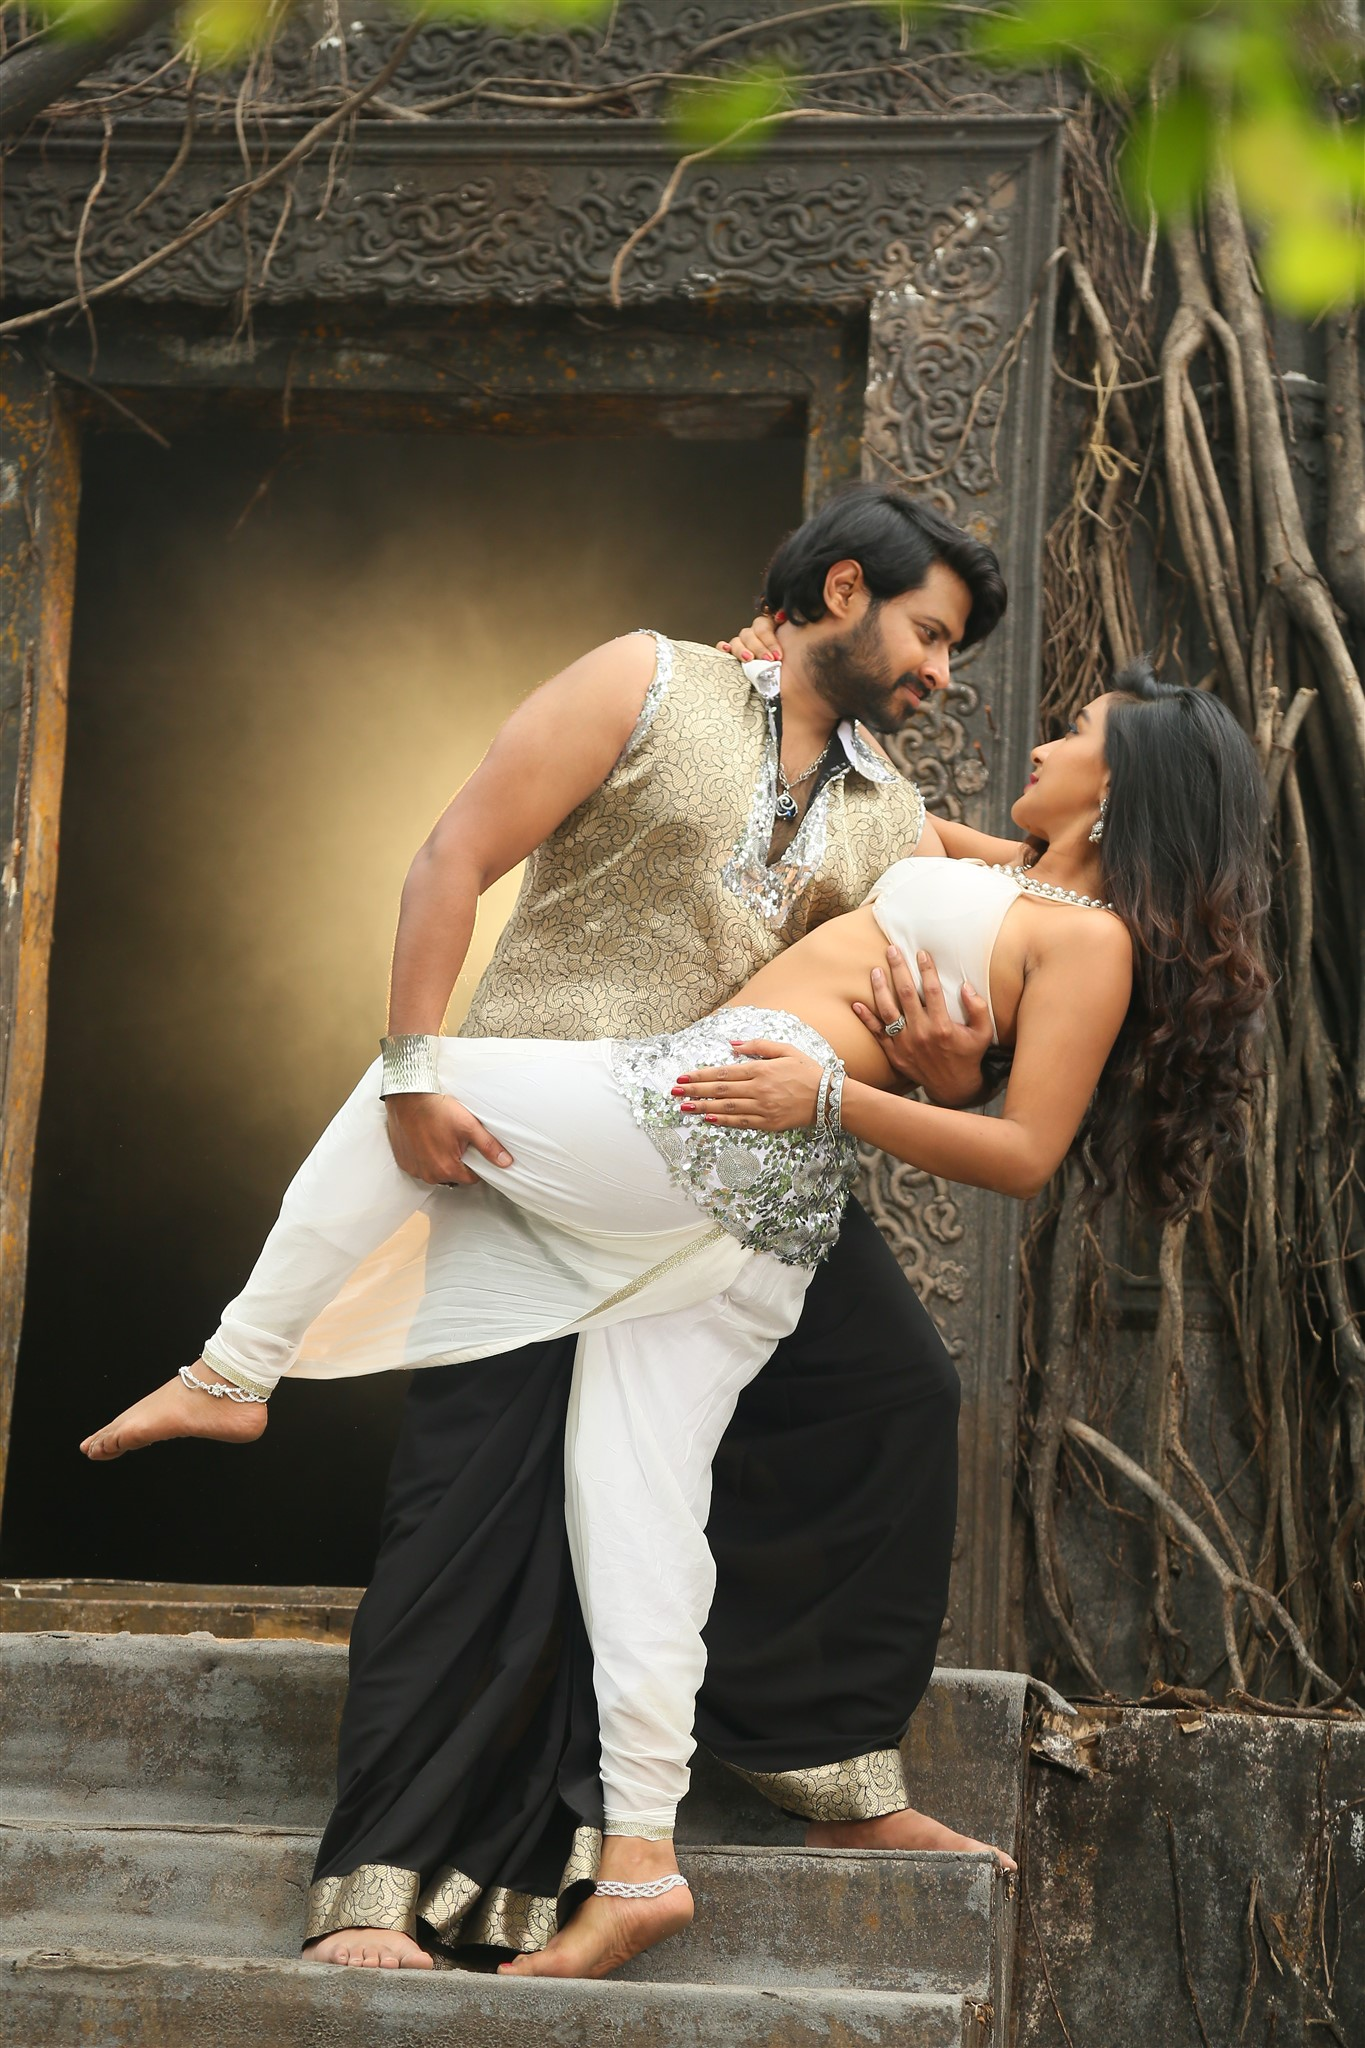 Mahidar, Sravya Rao in Natana Telugu Movie Images HD